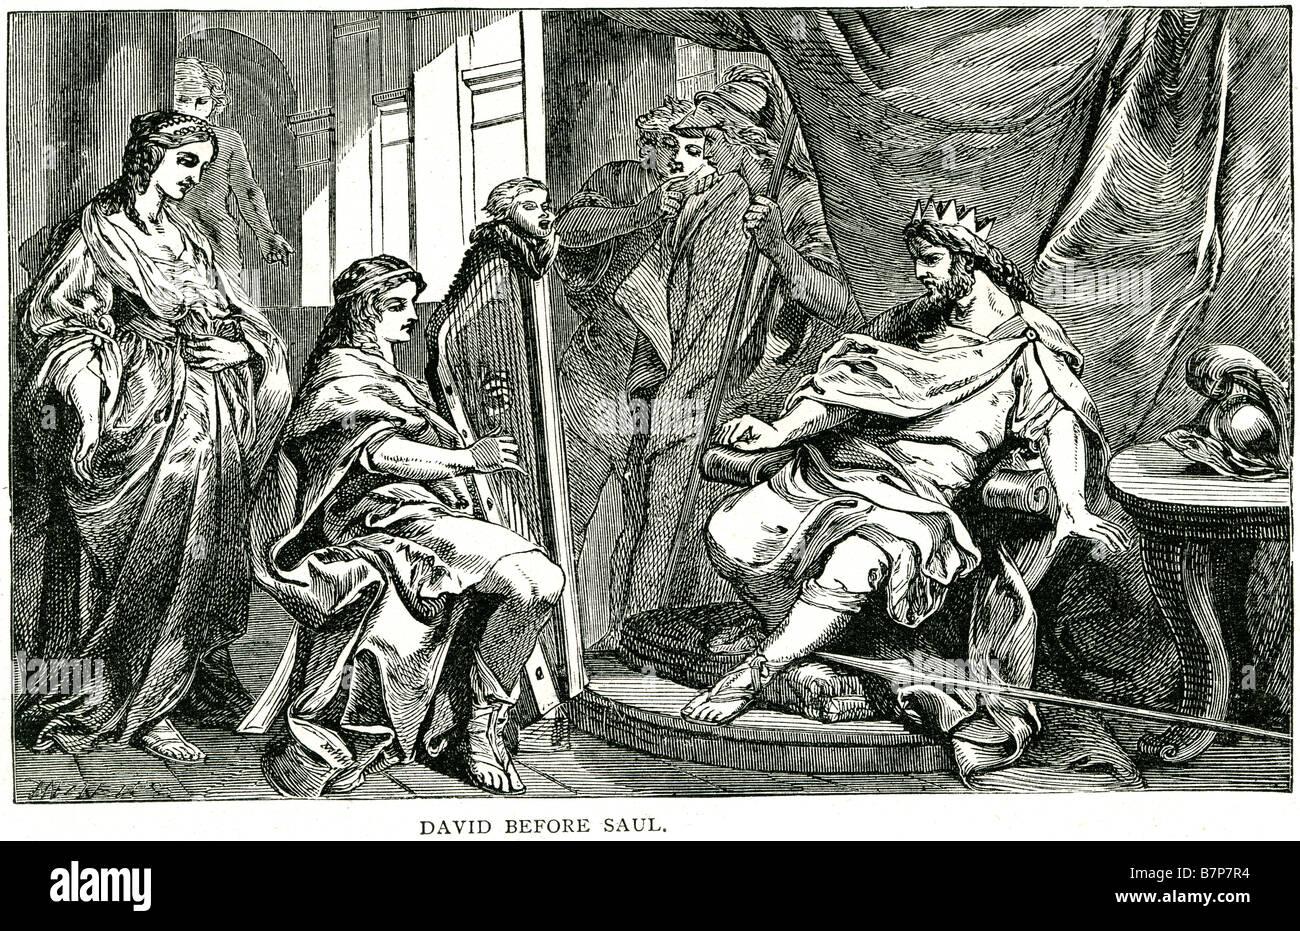 david before saul i samuel xvi 23 meeting harp player king god